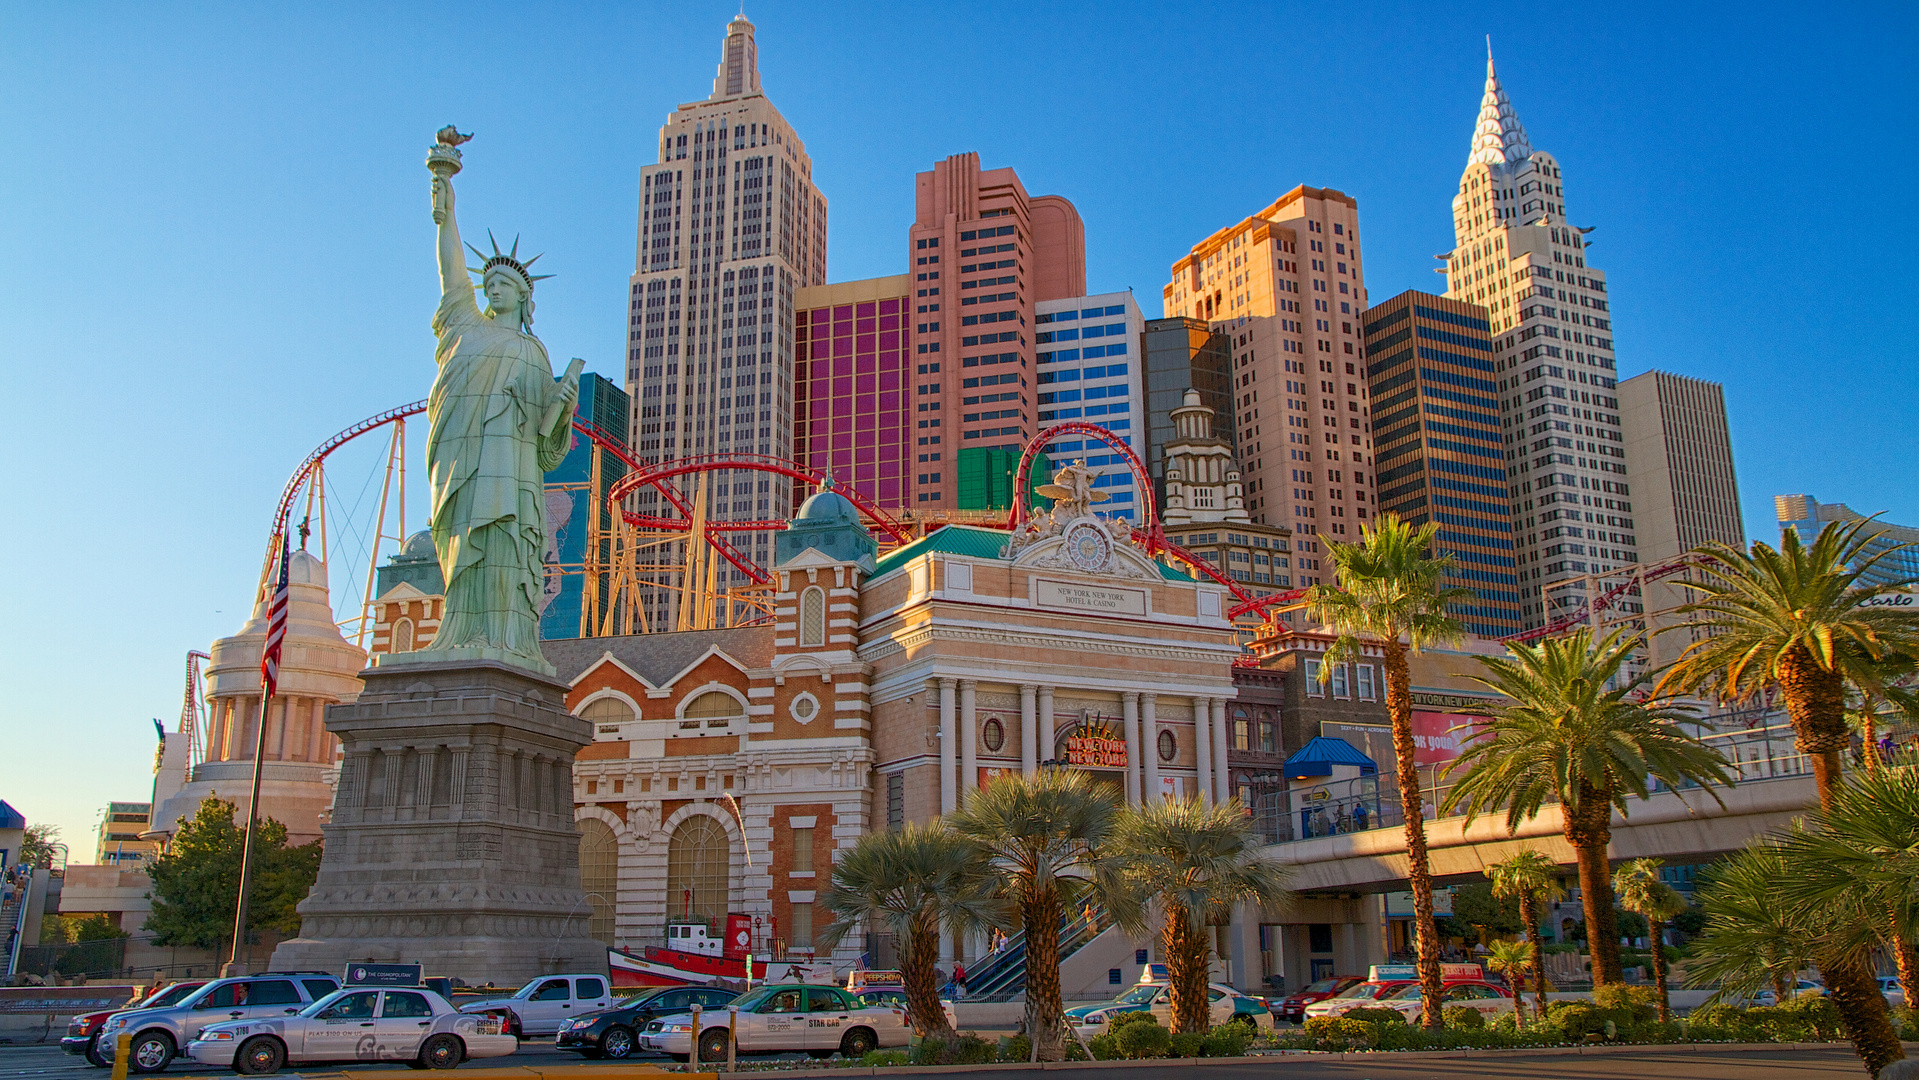 Hotel New York, New York in Las Vegas